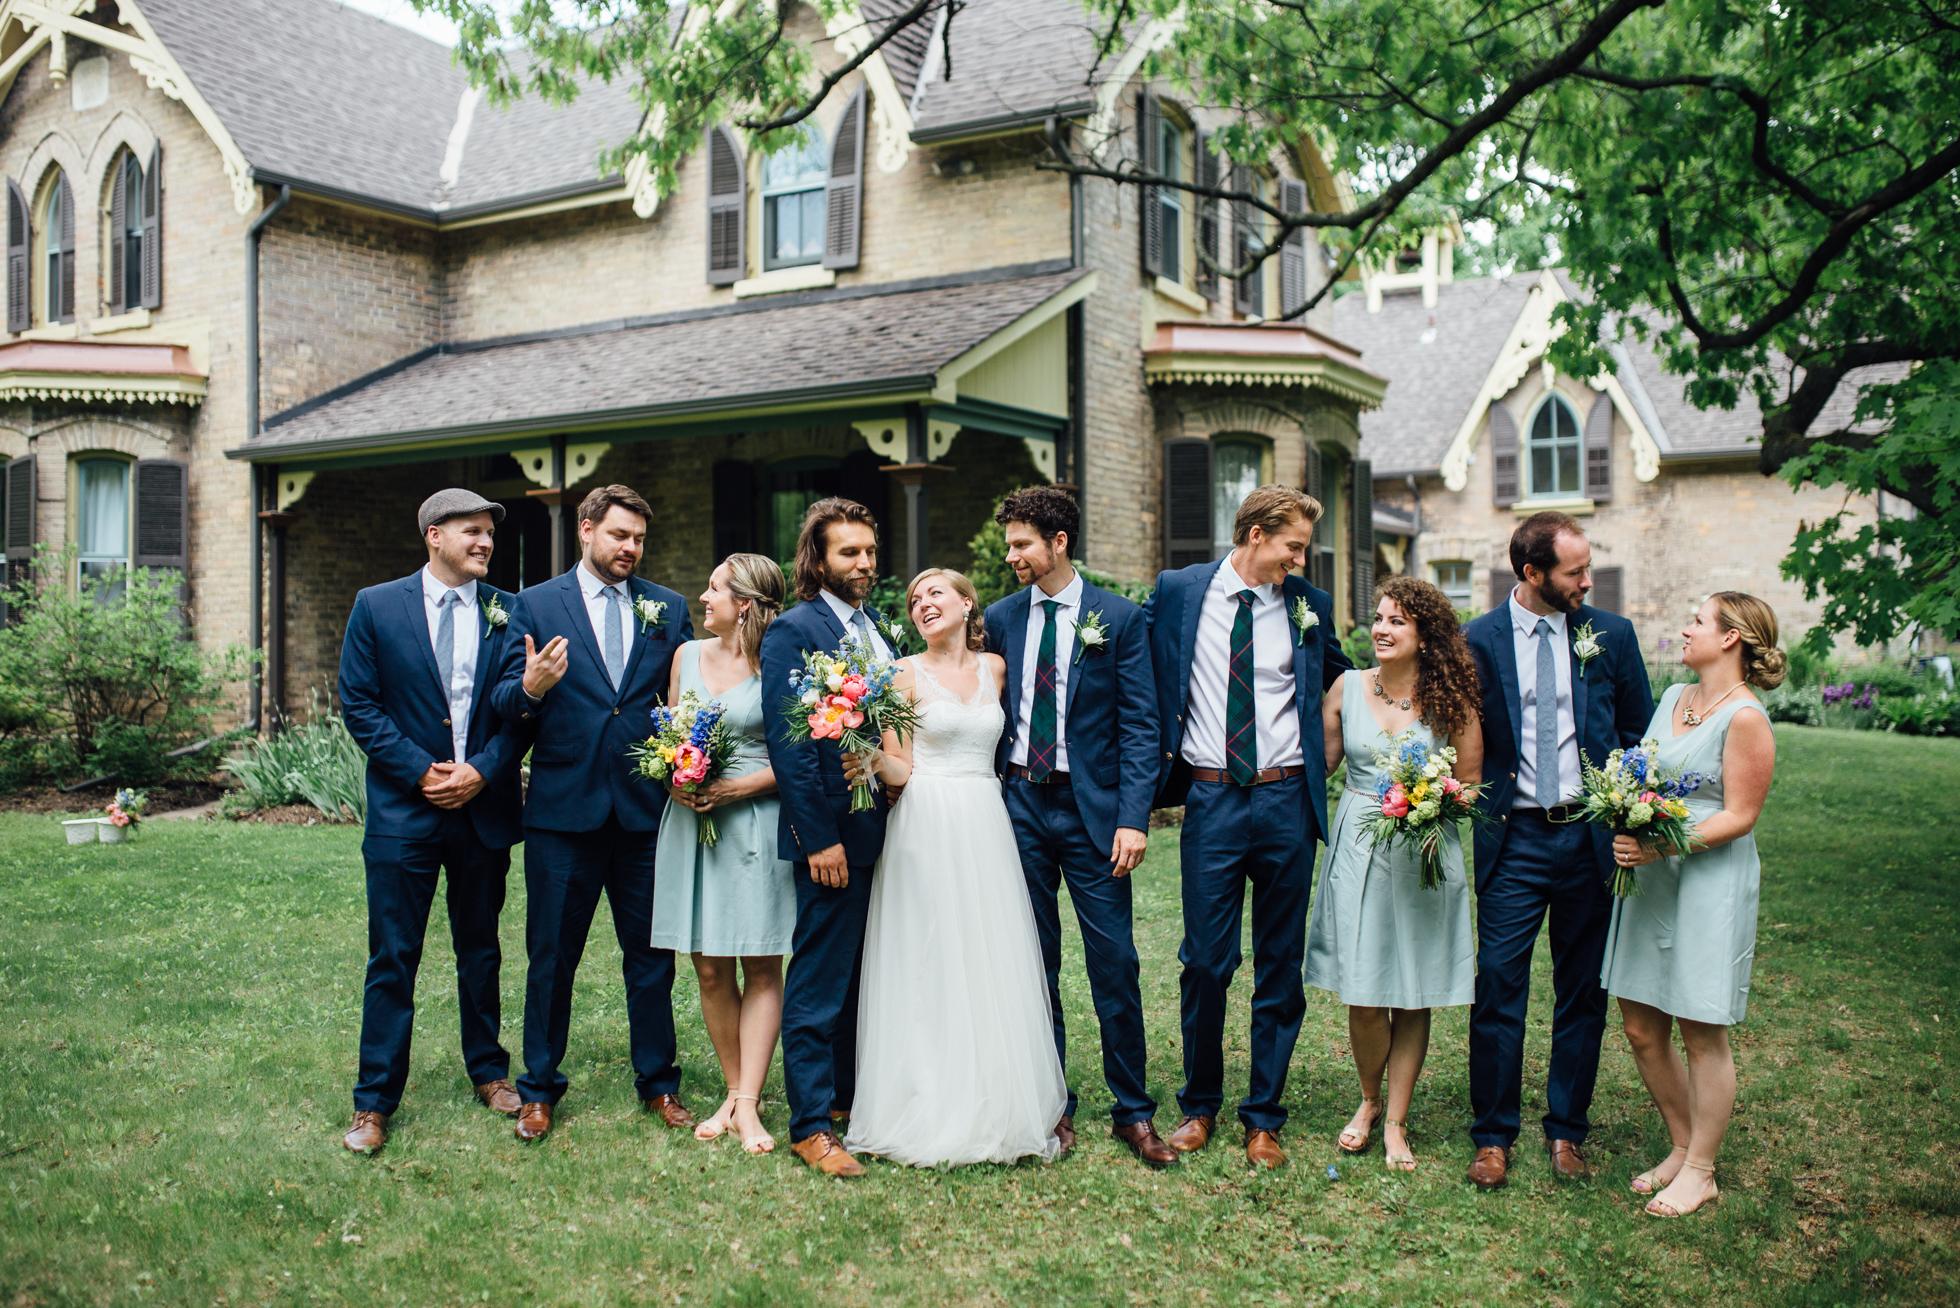 Outdoor-Caledon-Tralee-Wedding-Photography-42